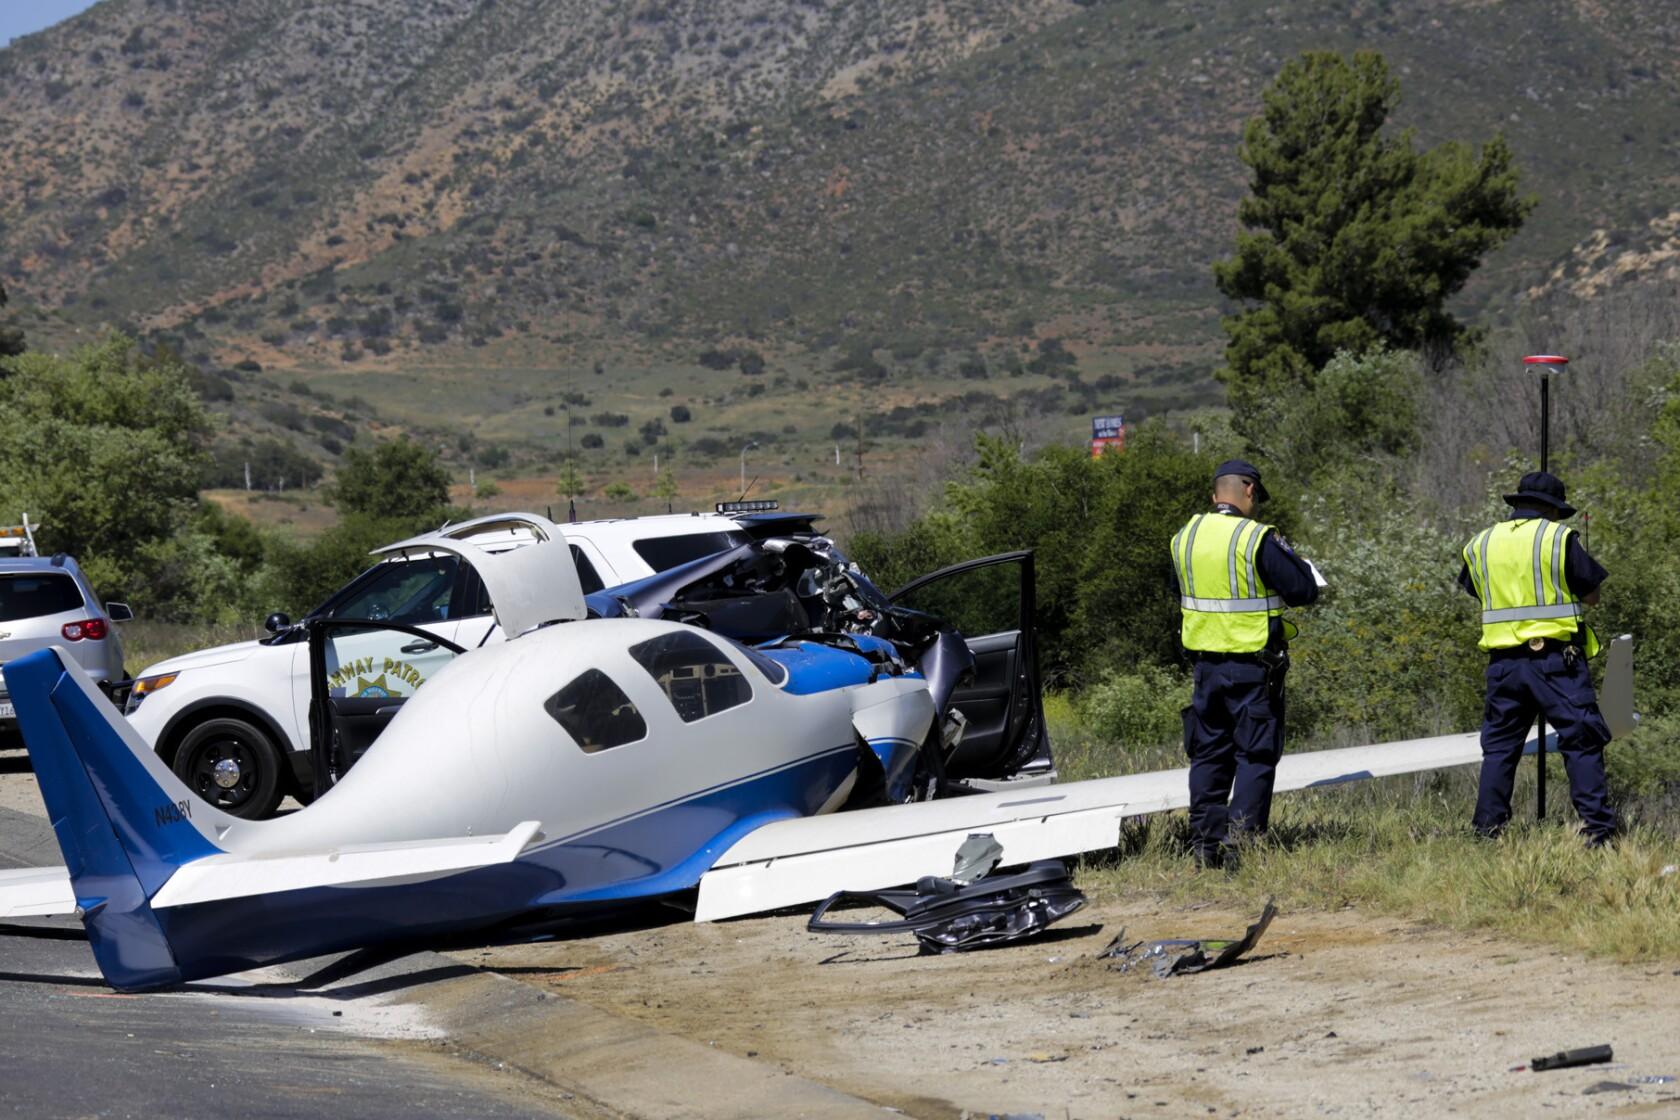 Roller Derby skater killed when plane slams into car on